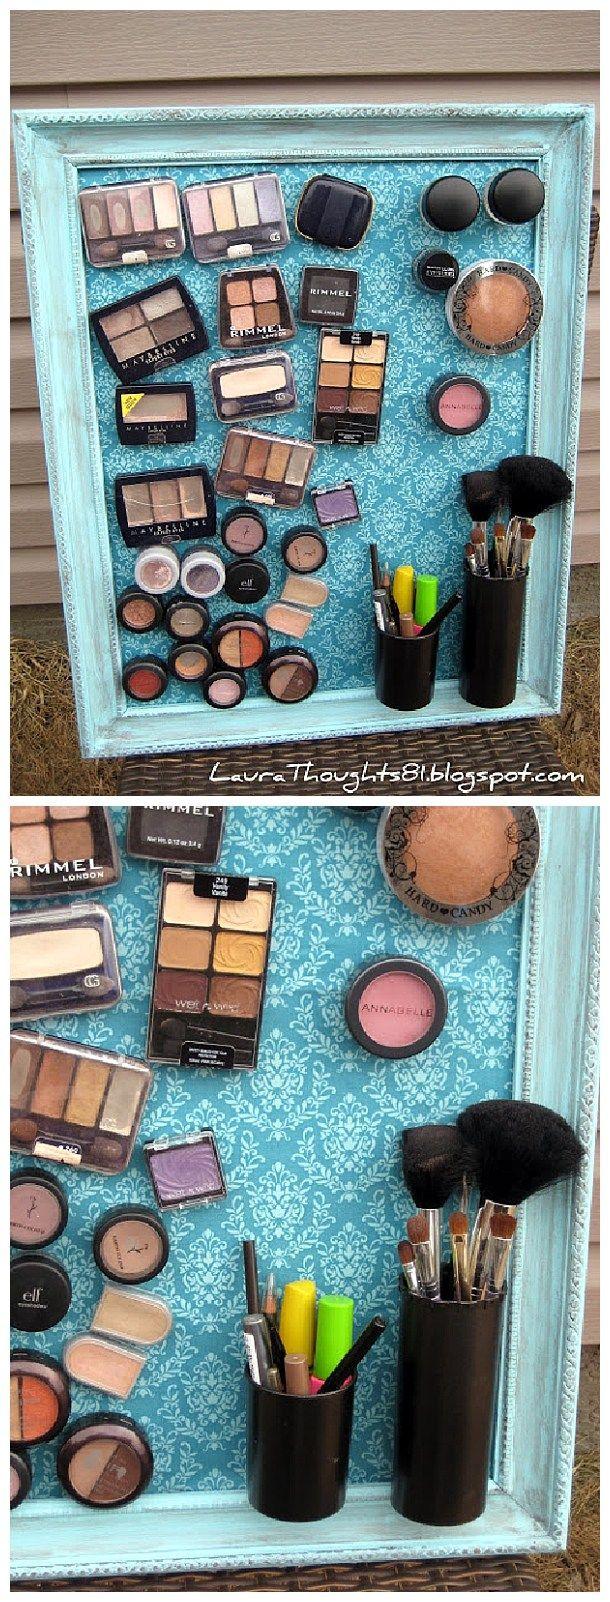 DIY Bathroom Organizer Ideas - DIY Magnetic Makeup and Beauty Tools Decorative Space Saving Organization Board via Laura Thoughts